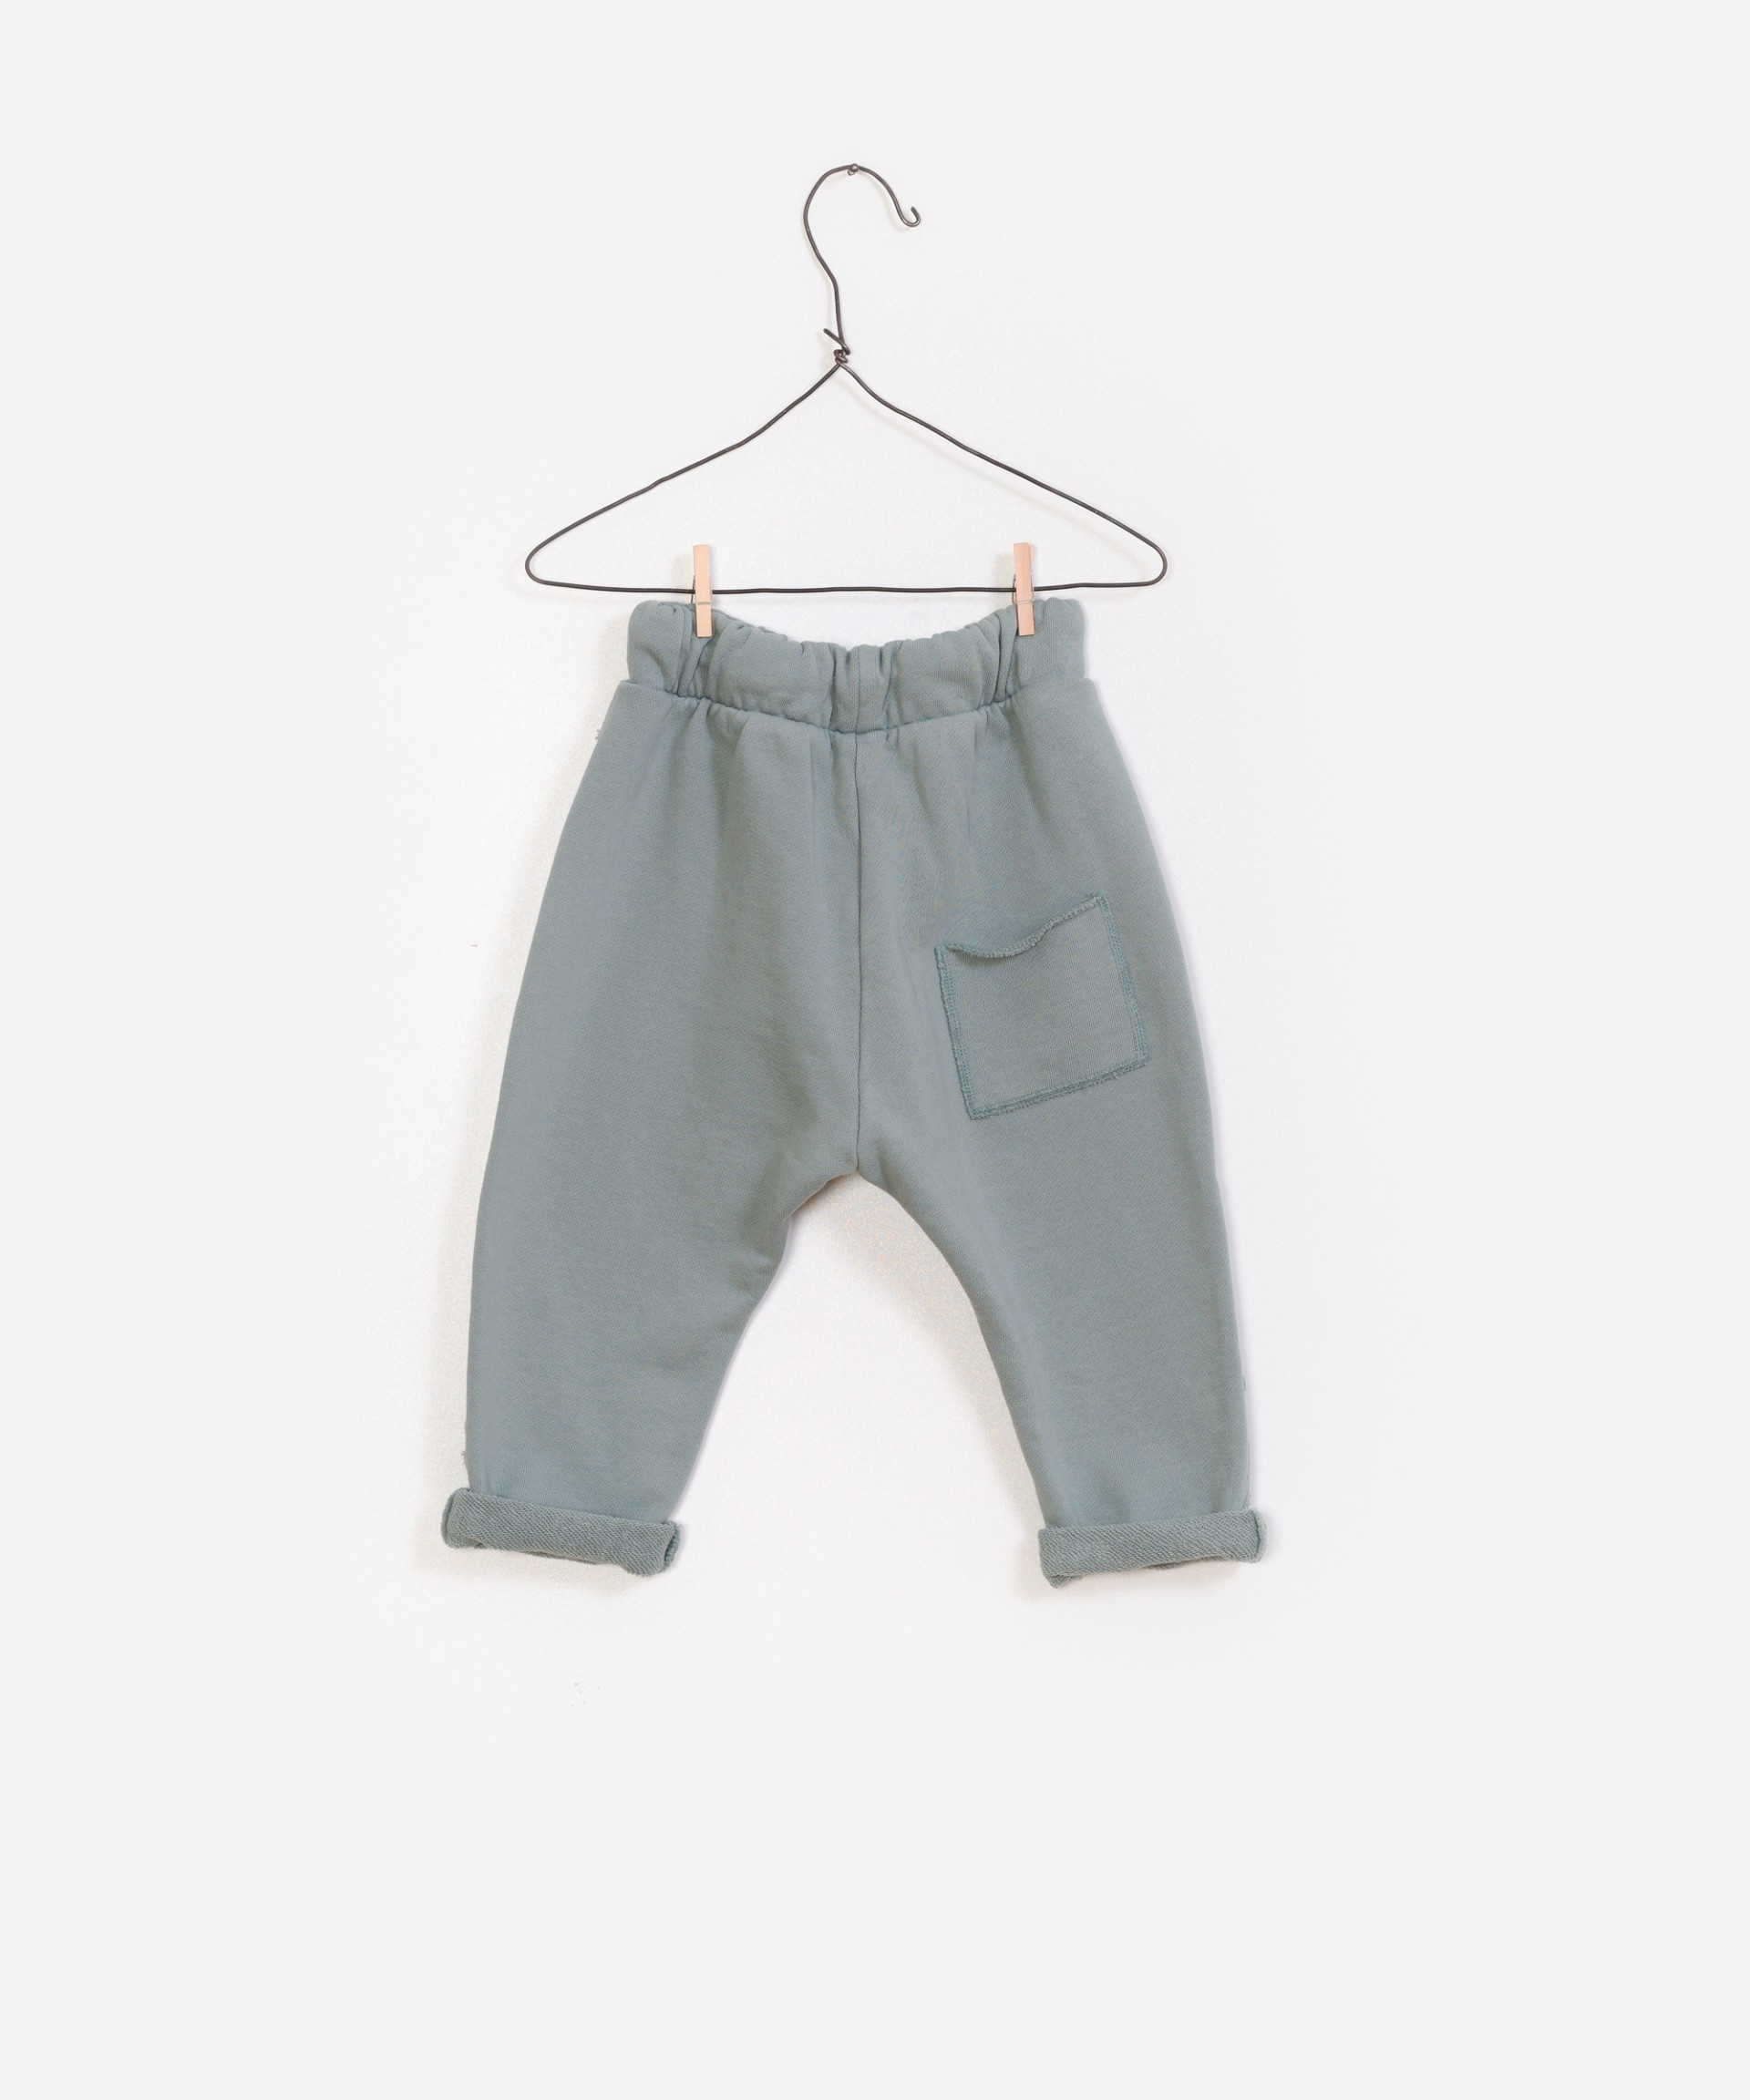 Pantalón Felpa 100% Algodón Orgánico